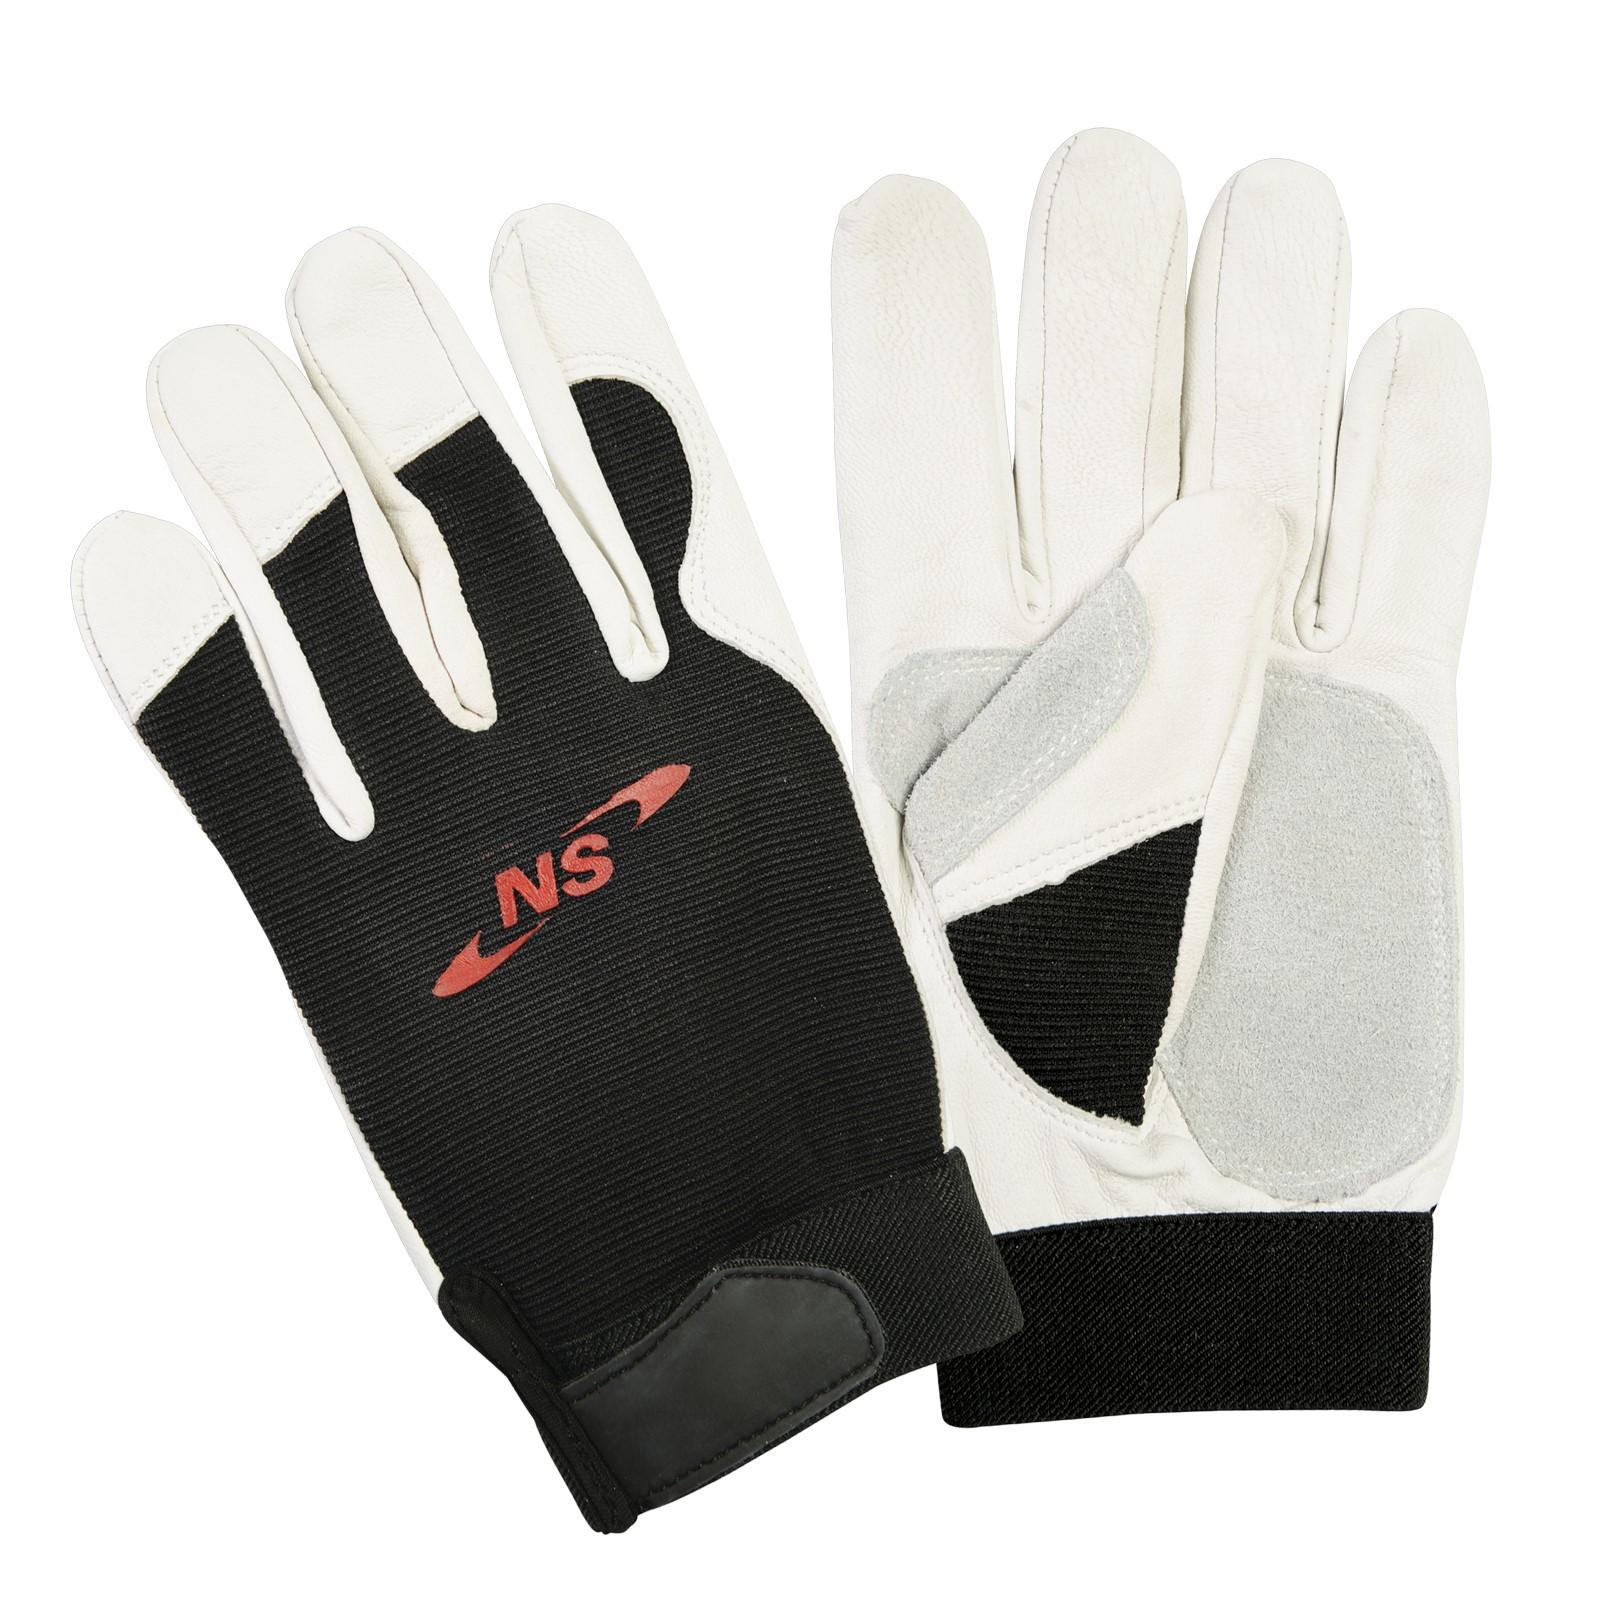 Sport In Gloves: NS Hydraulix Goatskin Sport Utility Gloves Pair